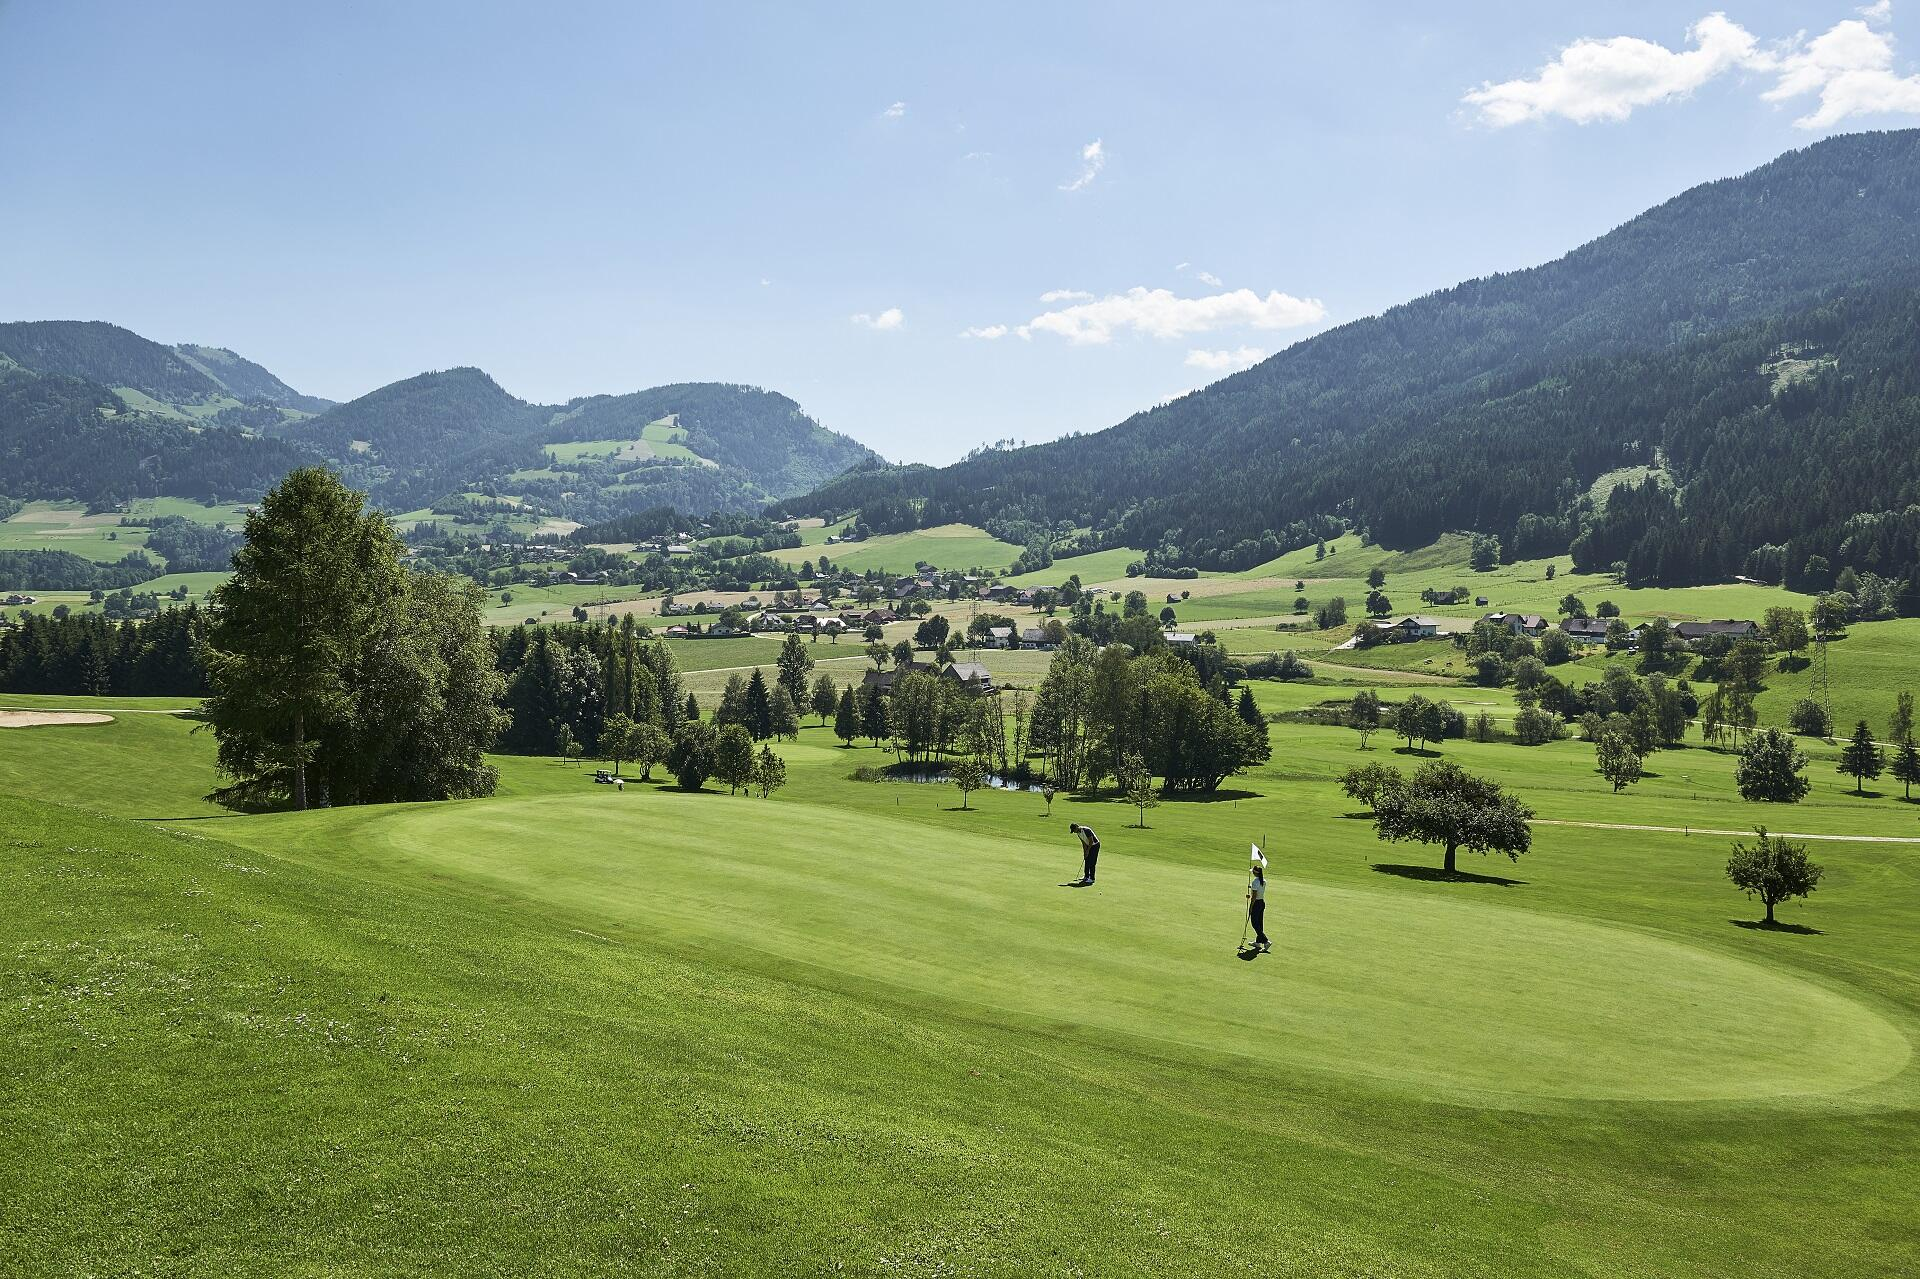 Golf course at Schloss Pichlarn